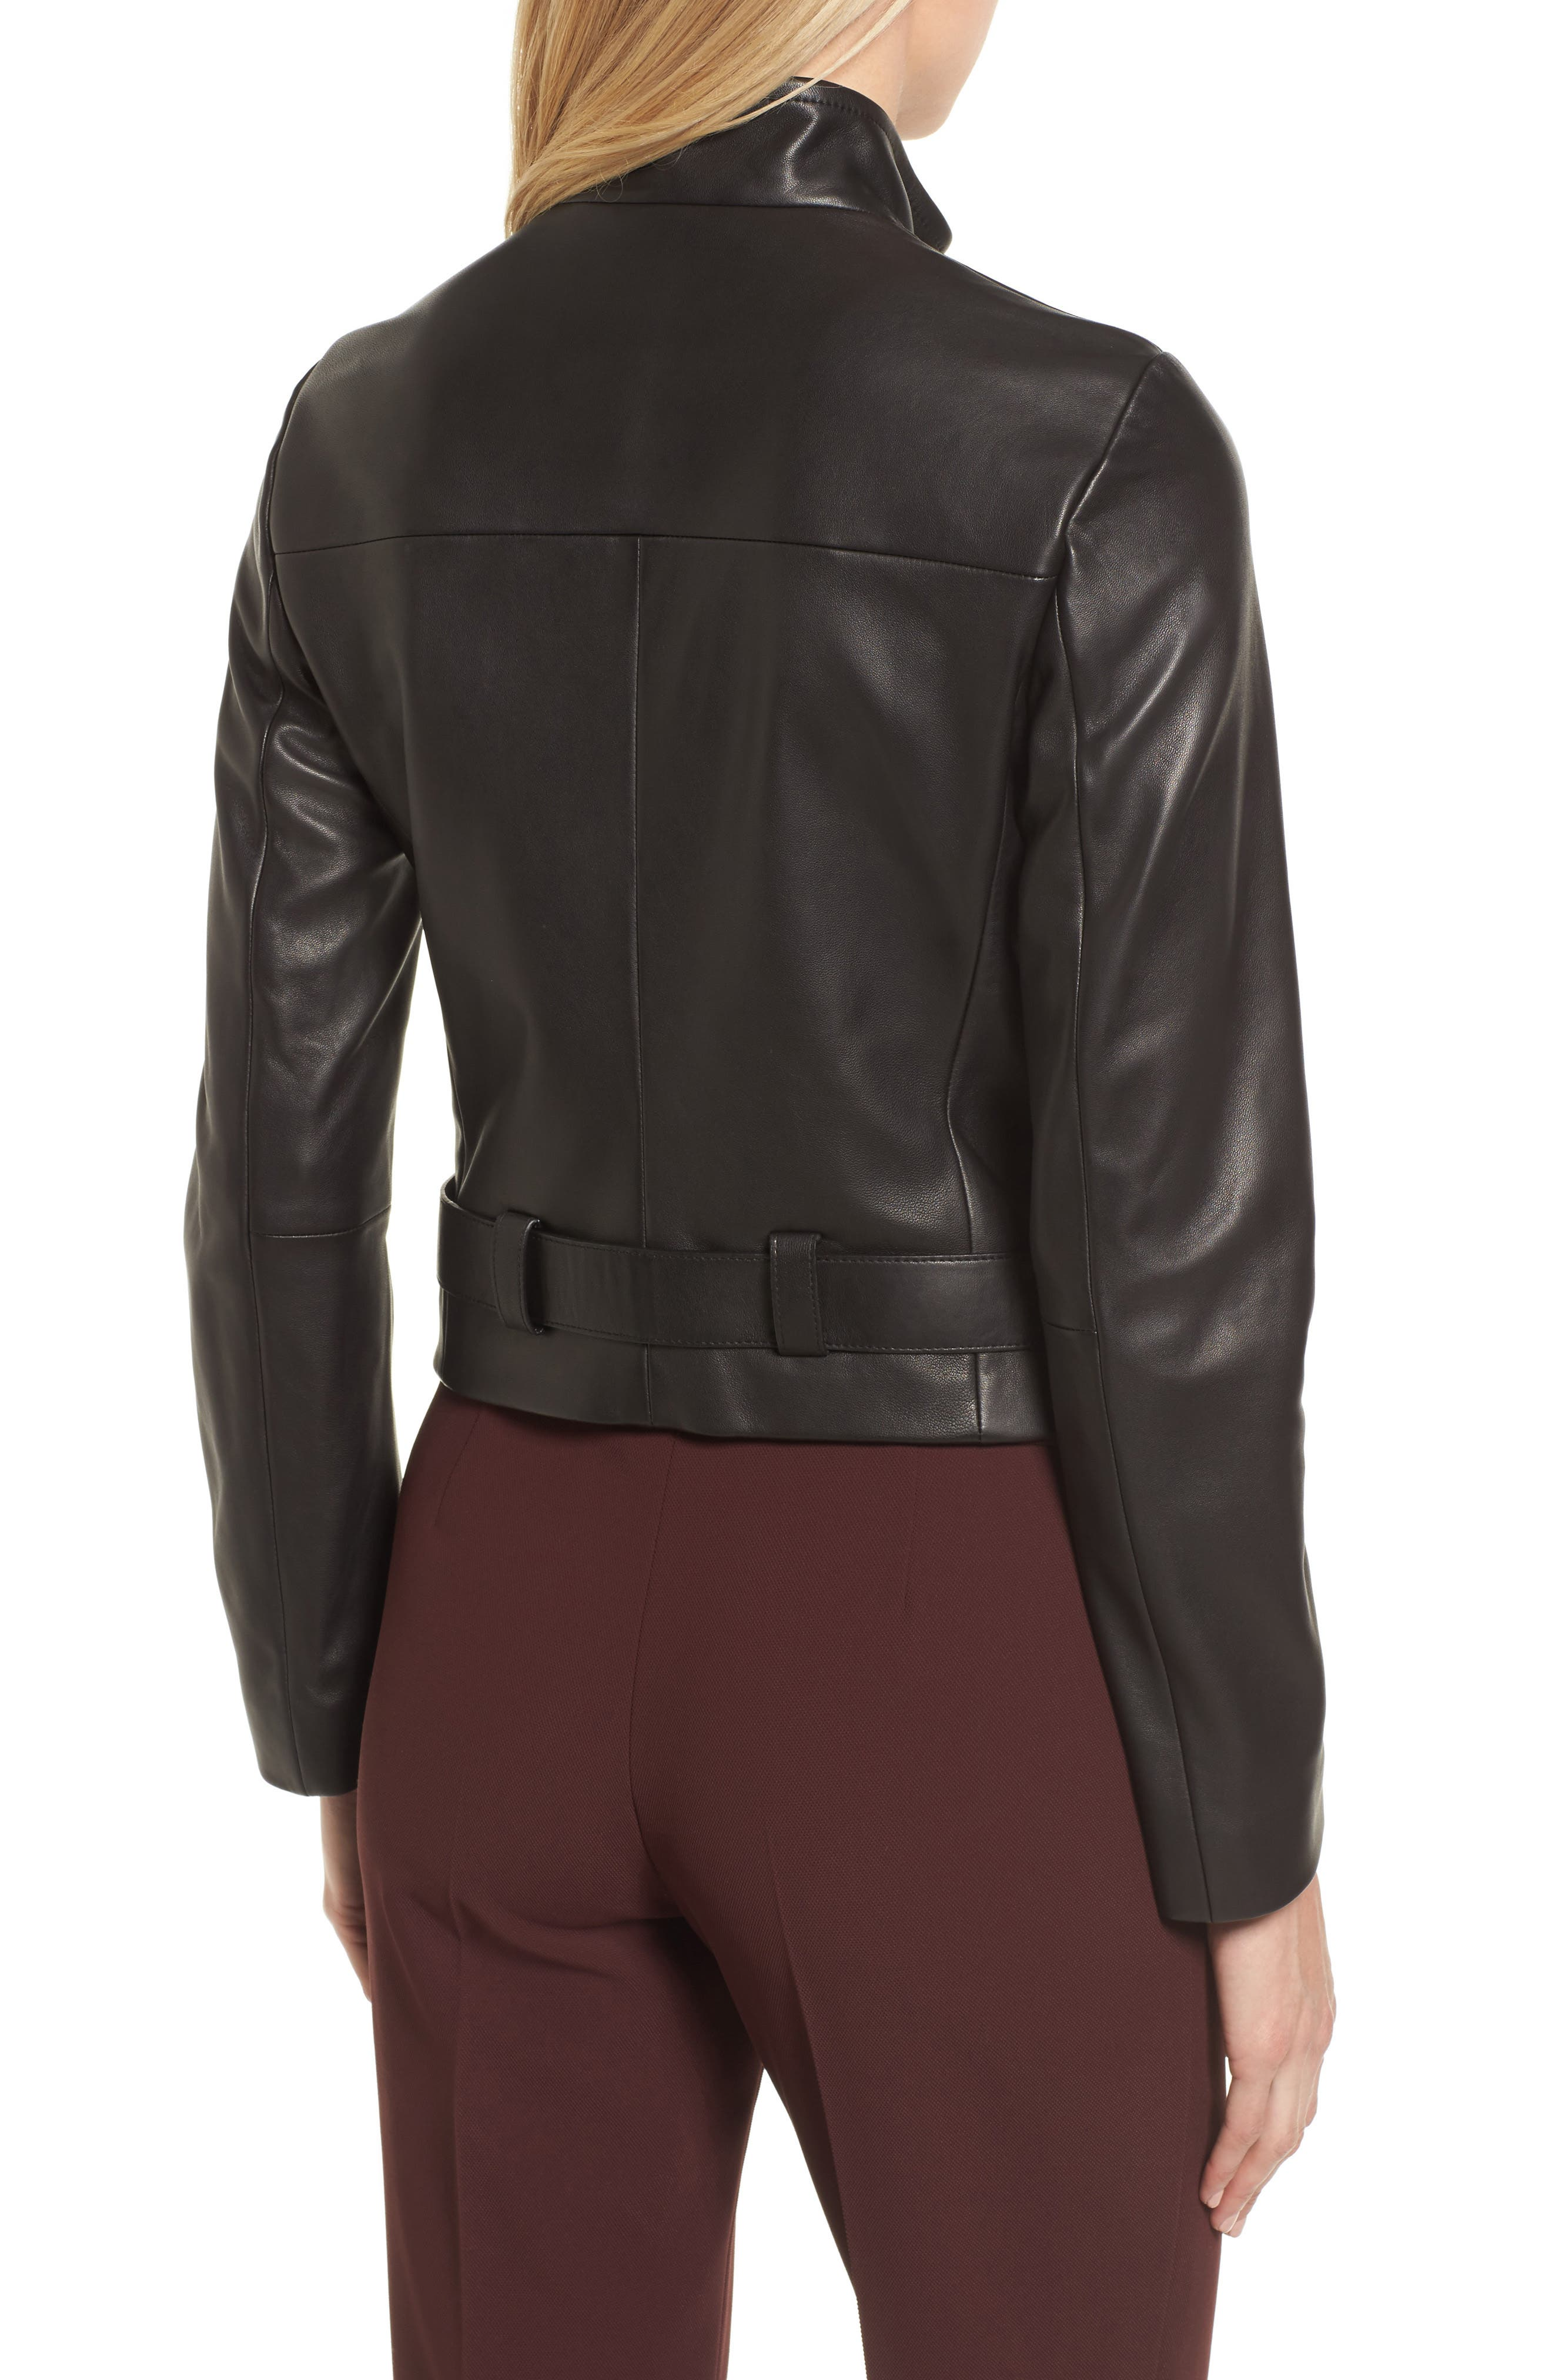 Sanuvo Leather Jacket,                             Alternate thumbnail 2, color,                             Black